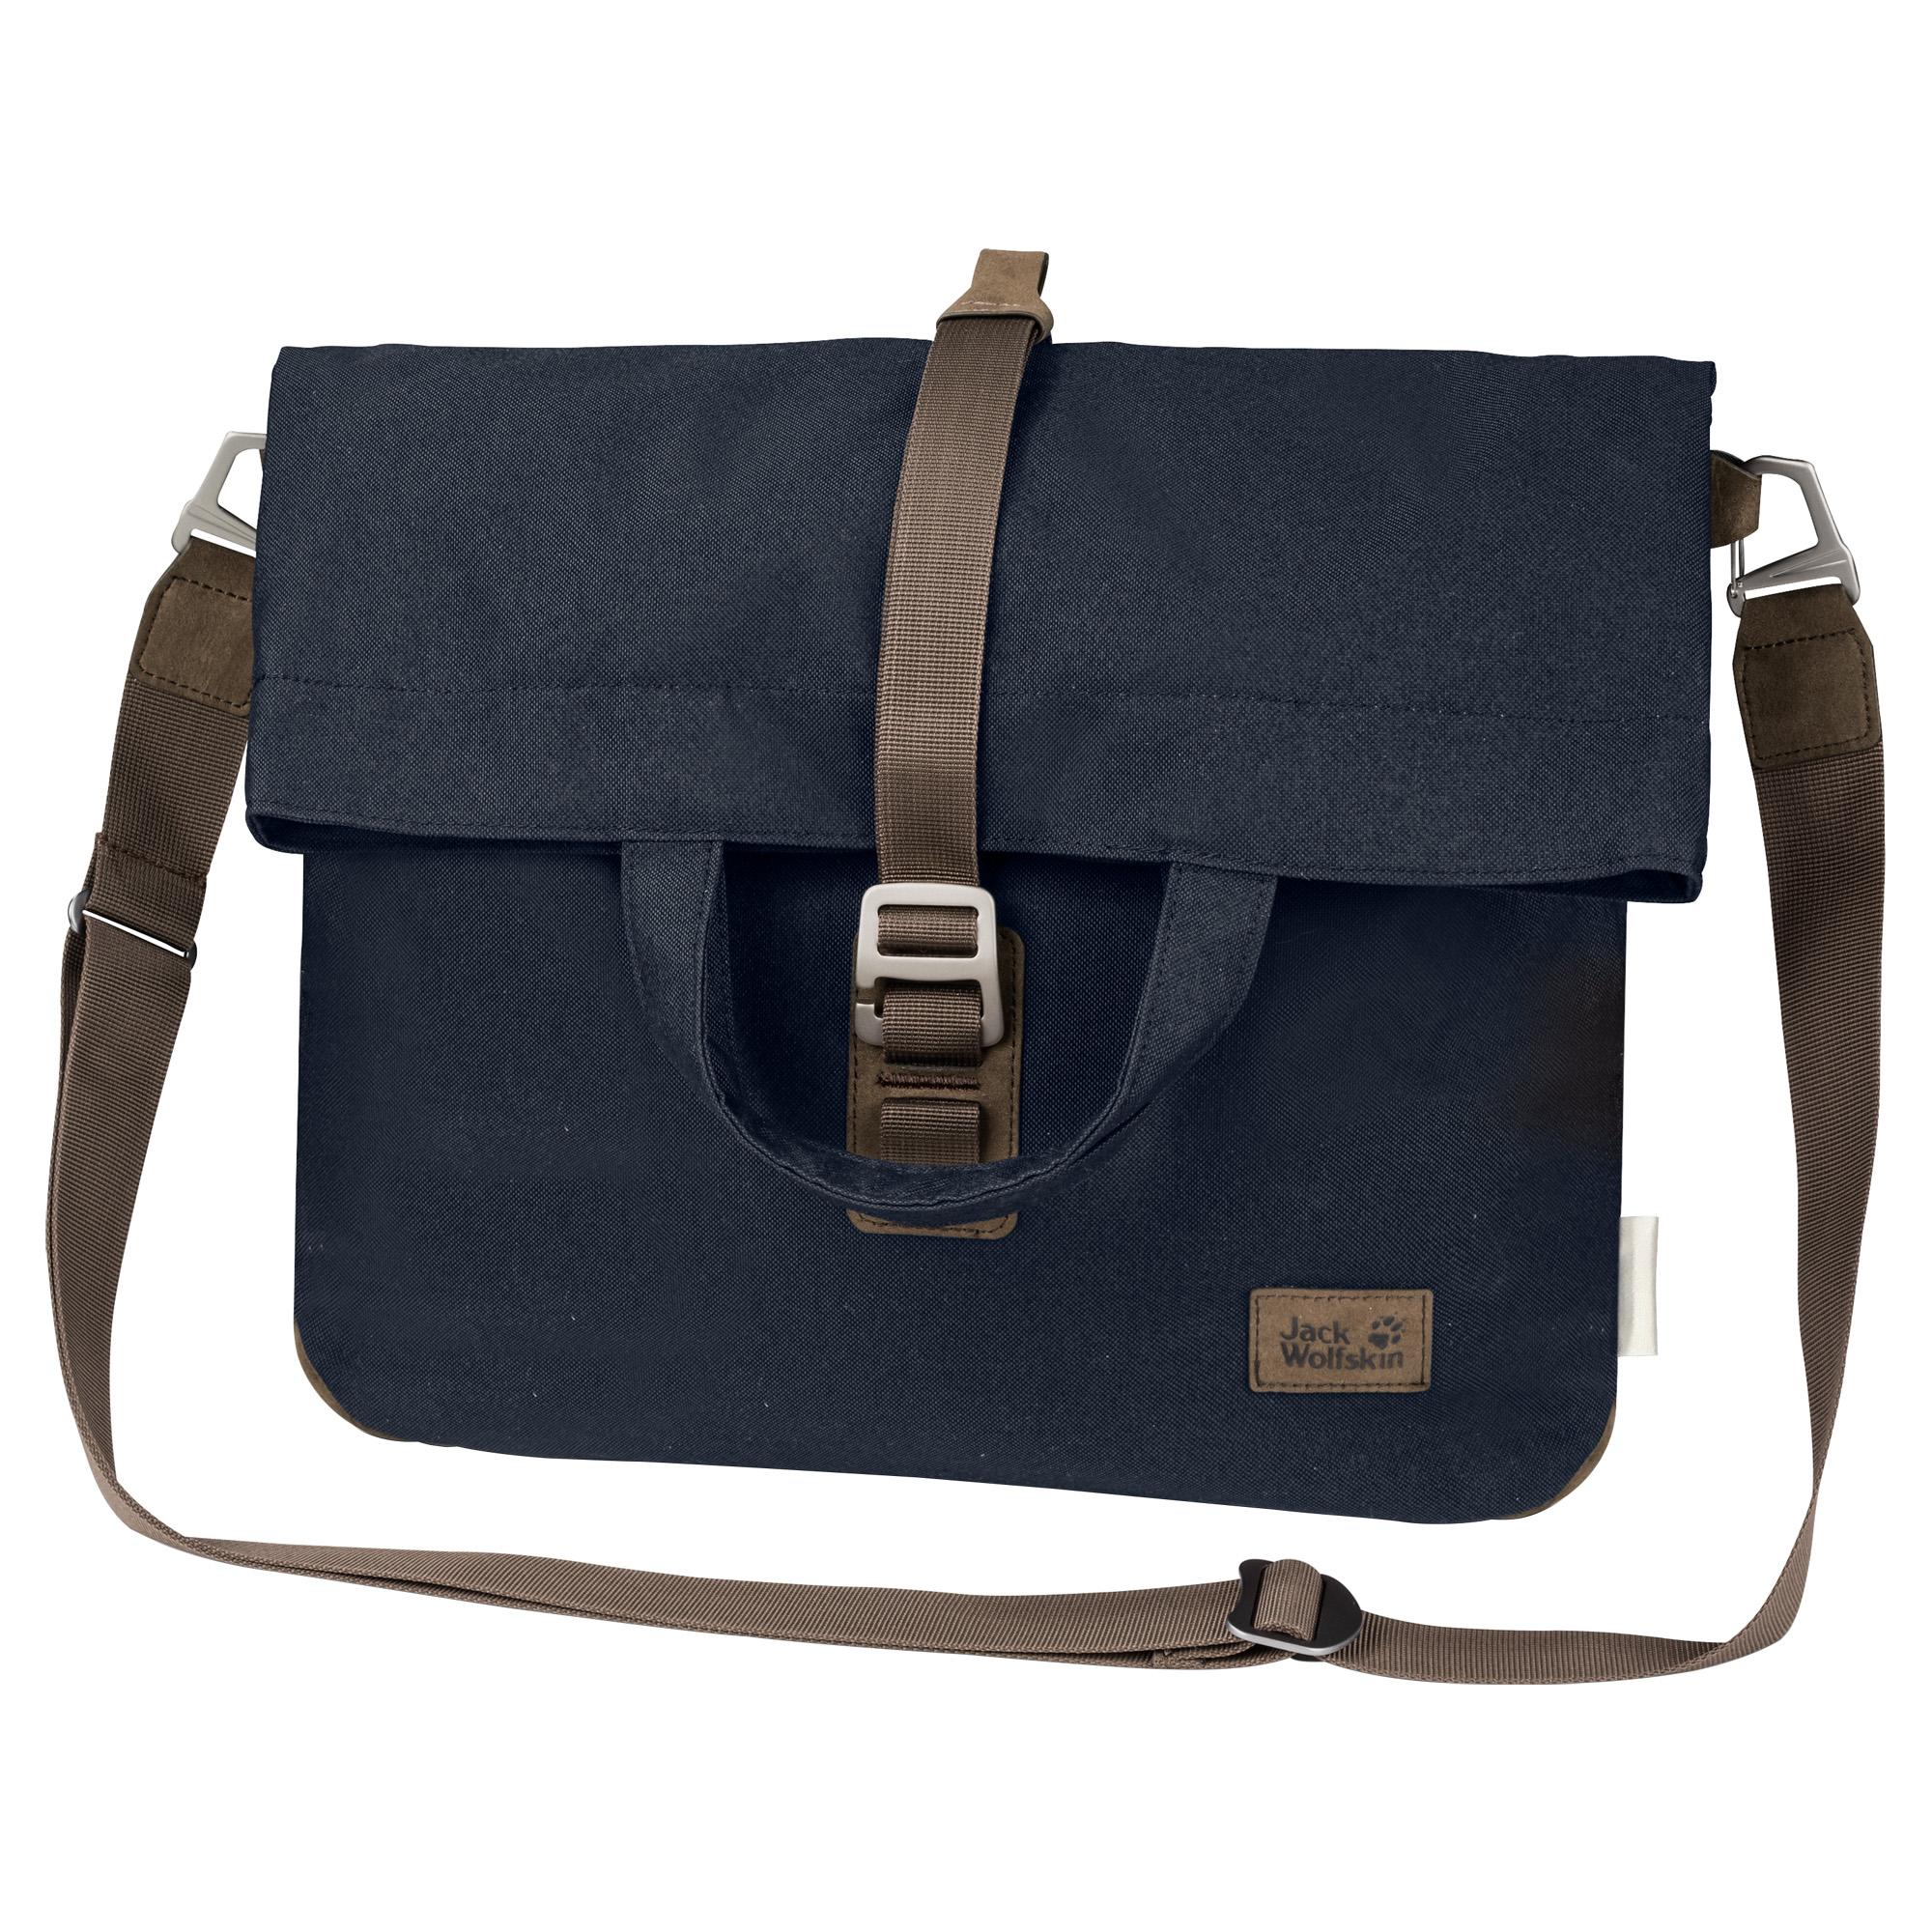 jack-wolfskin-soho-ride-bag-umh-auml-ngetasche-farbe-1010-night-blue-